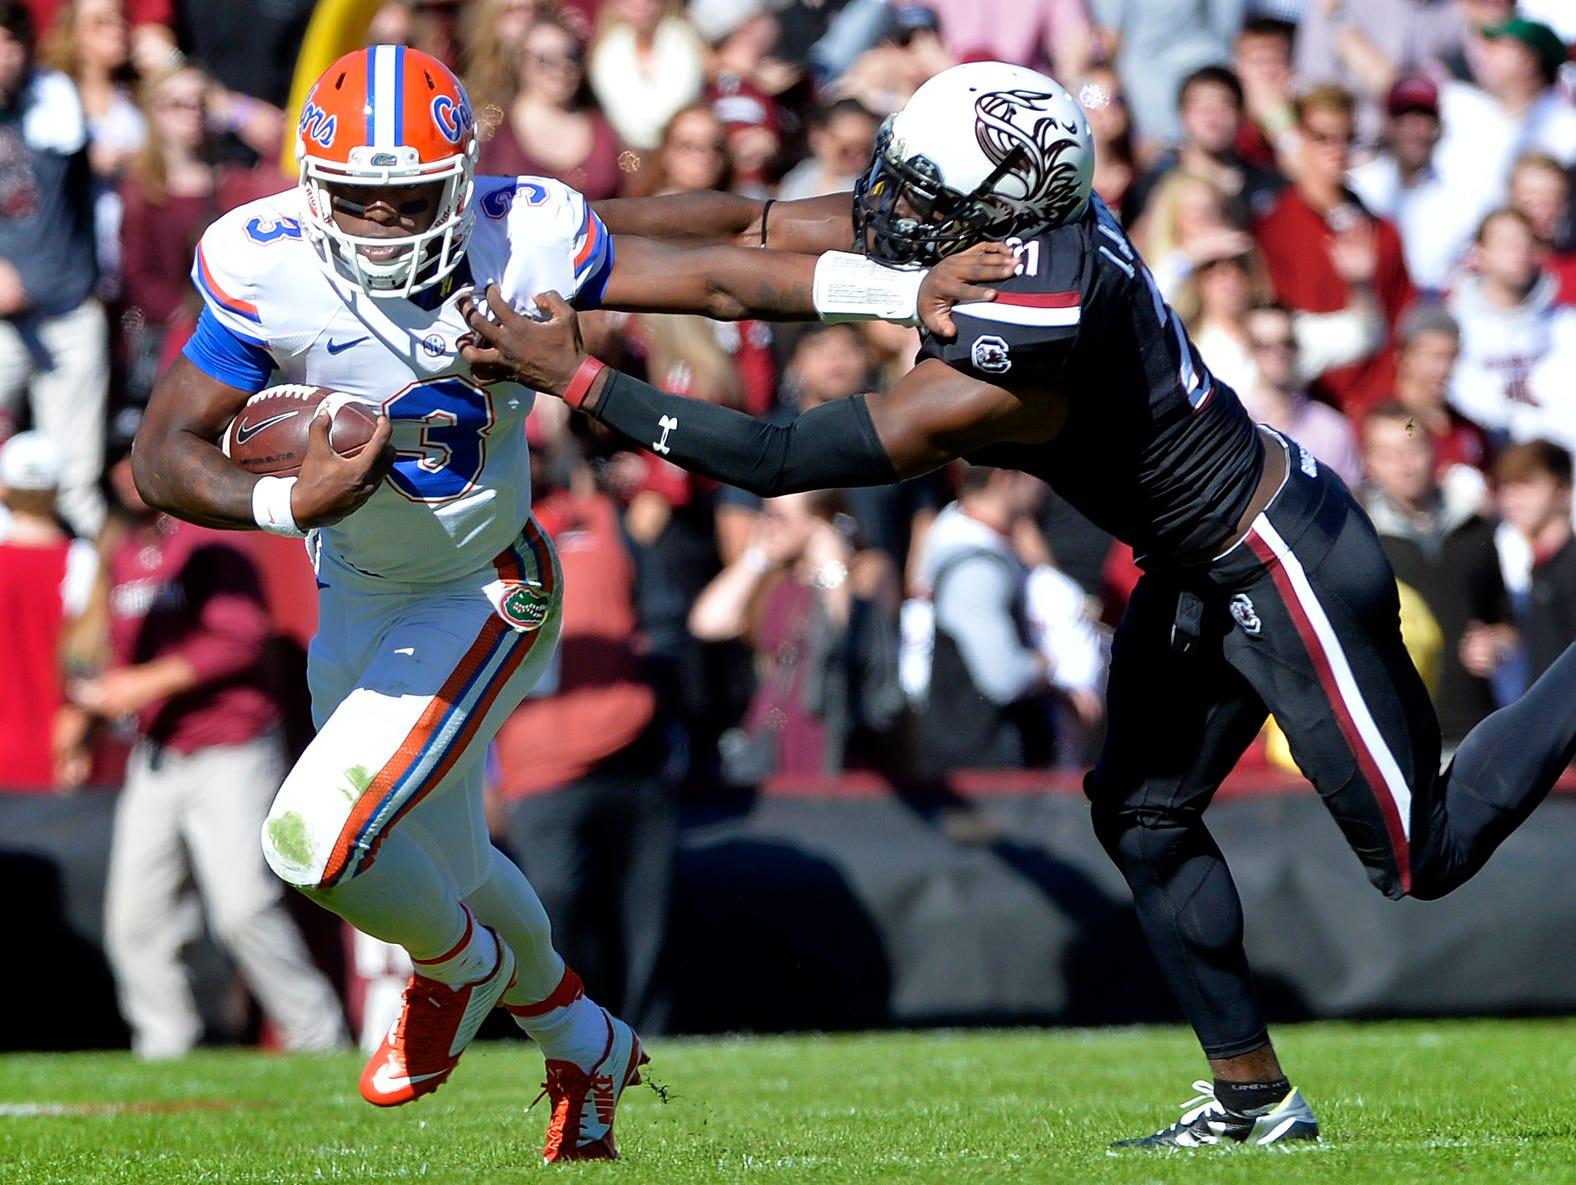 Florida quarterback Treon Harris (3) stiff-arms USC linebacker T.J. Holloman (11) and gets the first down at Williams-Brice Stadium in Columbia on Nov. 14, 2015.